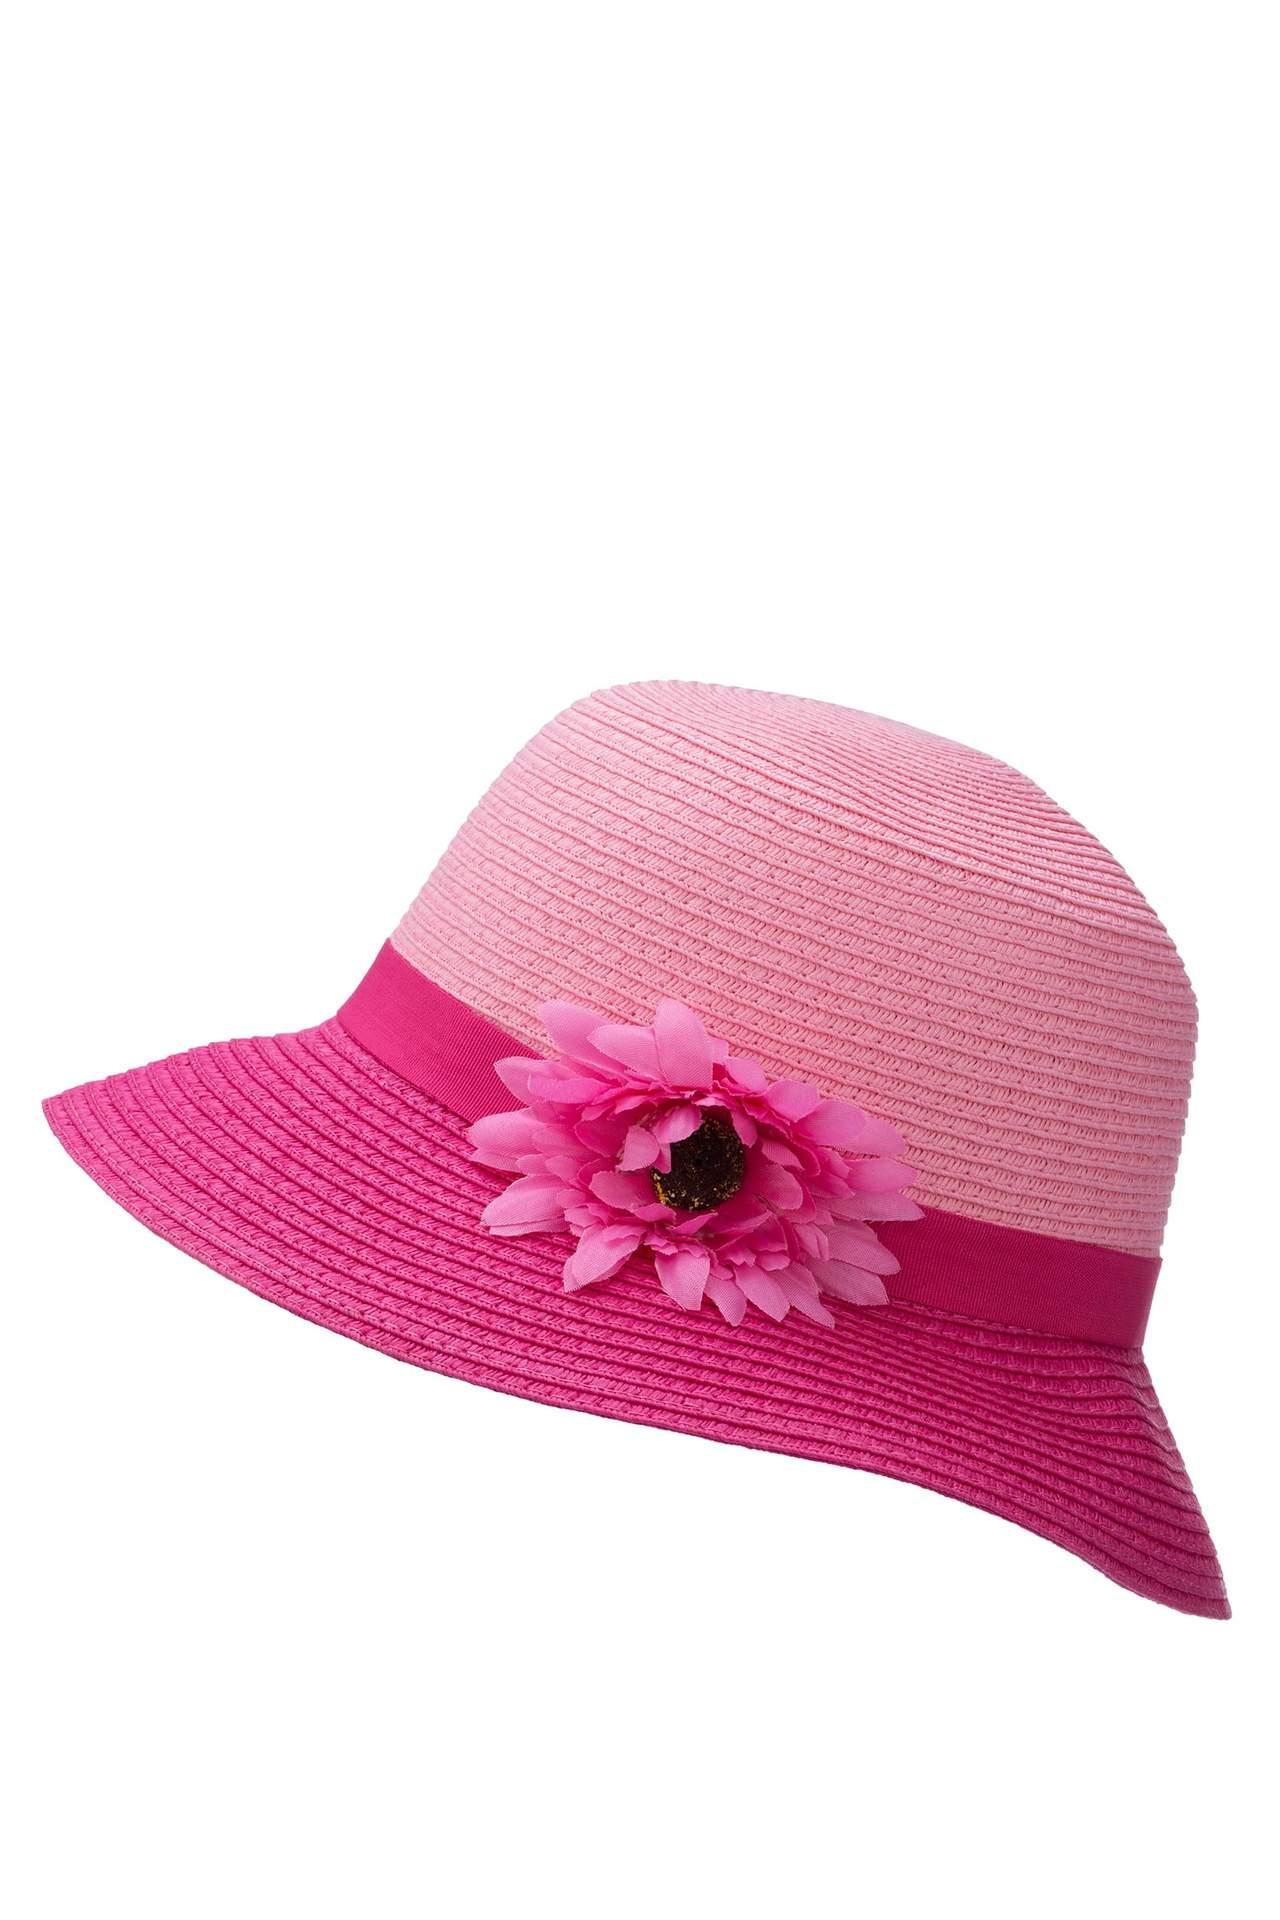 DeFacto Kız Çocuk Hasır Şapka Pembe female